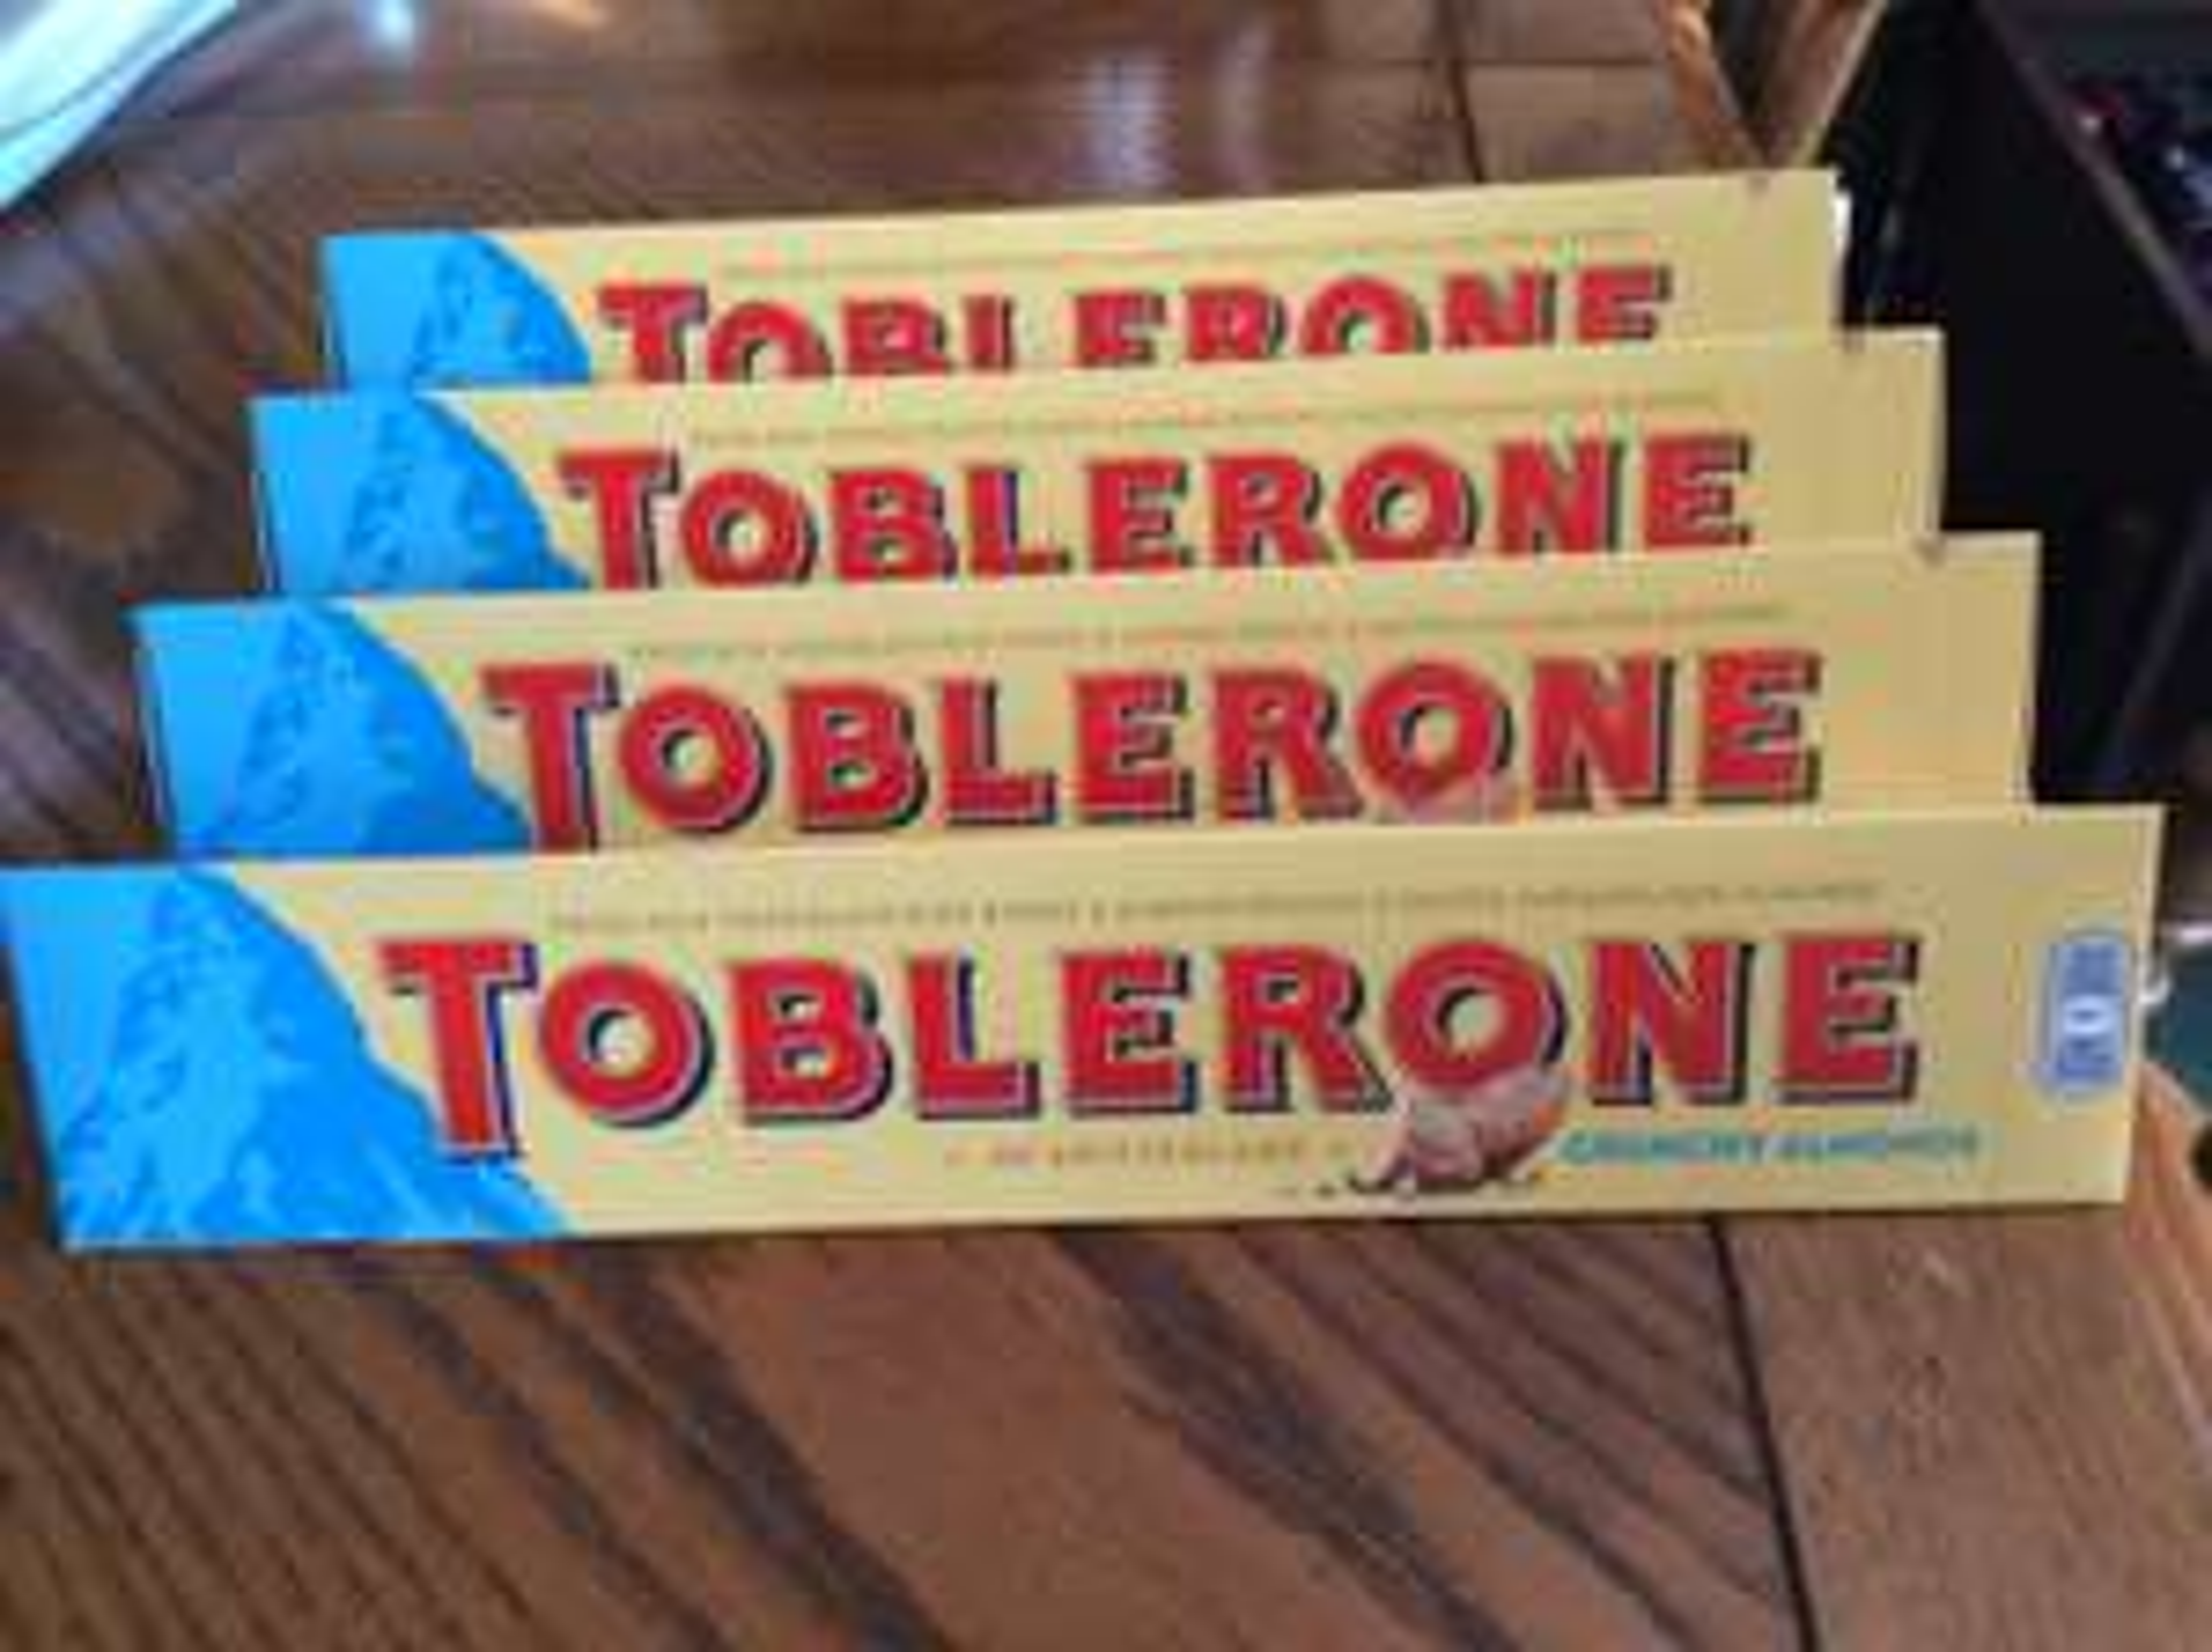 Toblerone crunchy almonds 360g for £1 @ Asda Redditch